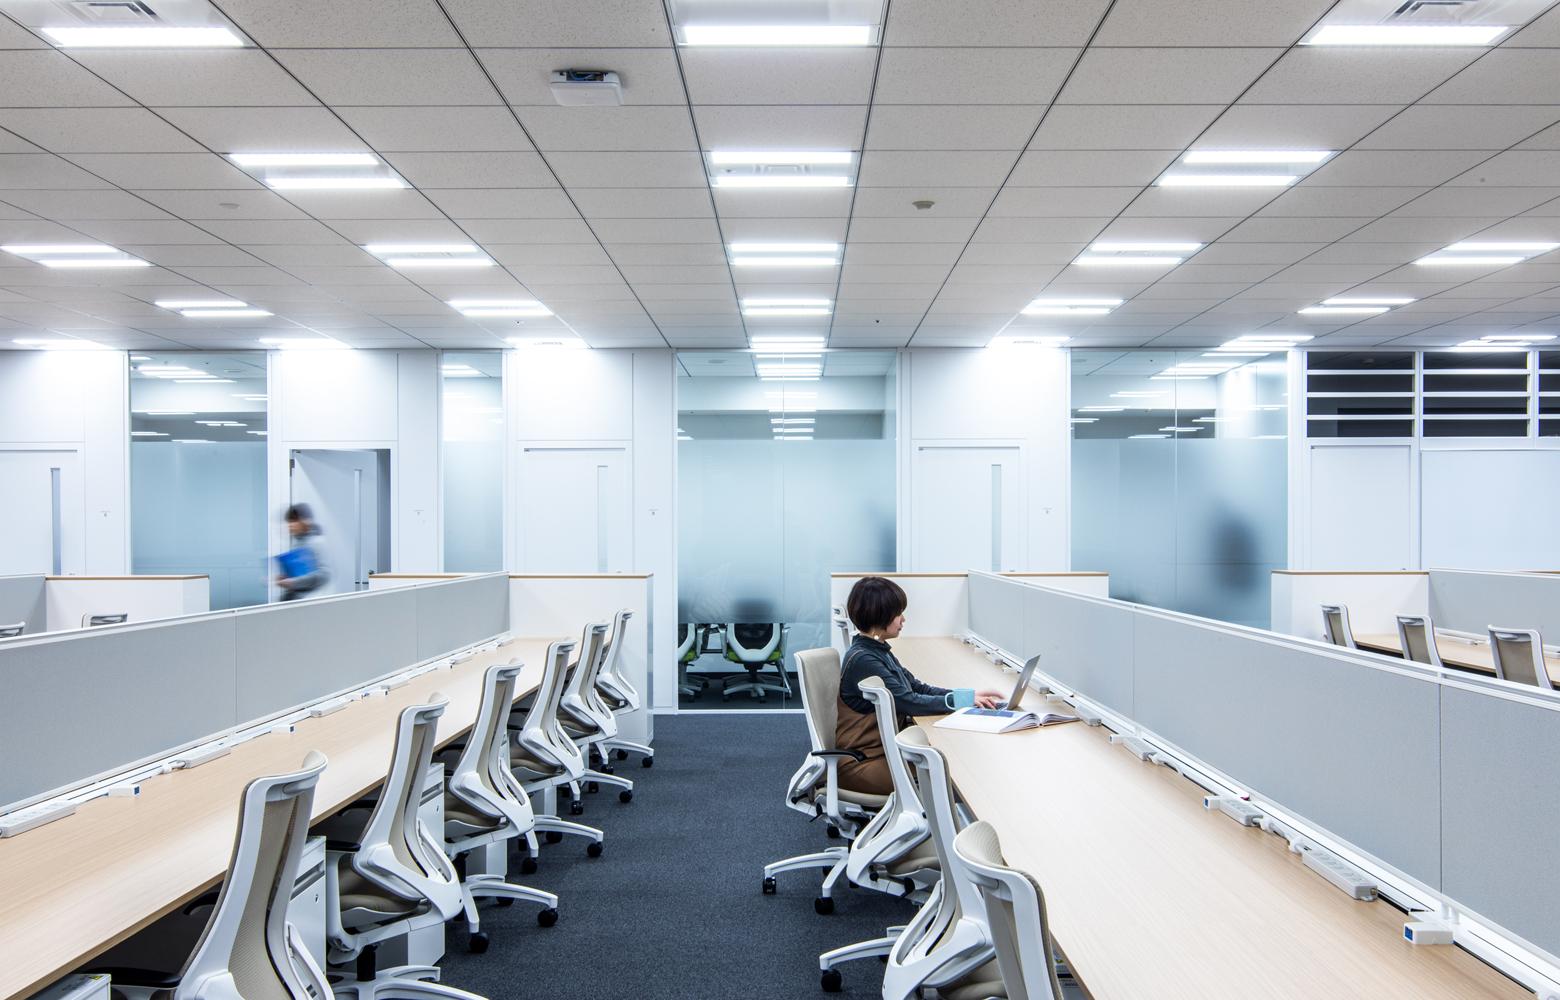 KLab株式会社 Roppongi Office Work Space デザイン・レイアウト事例